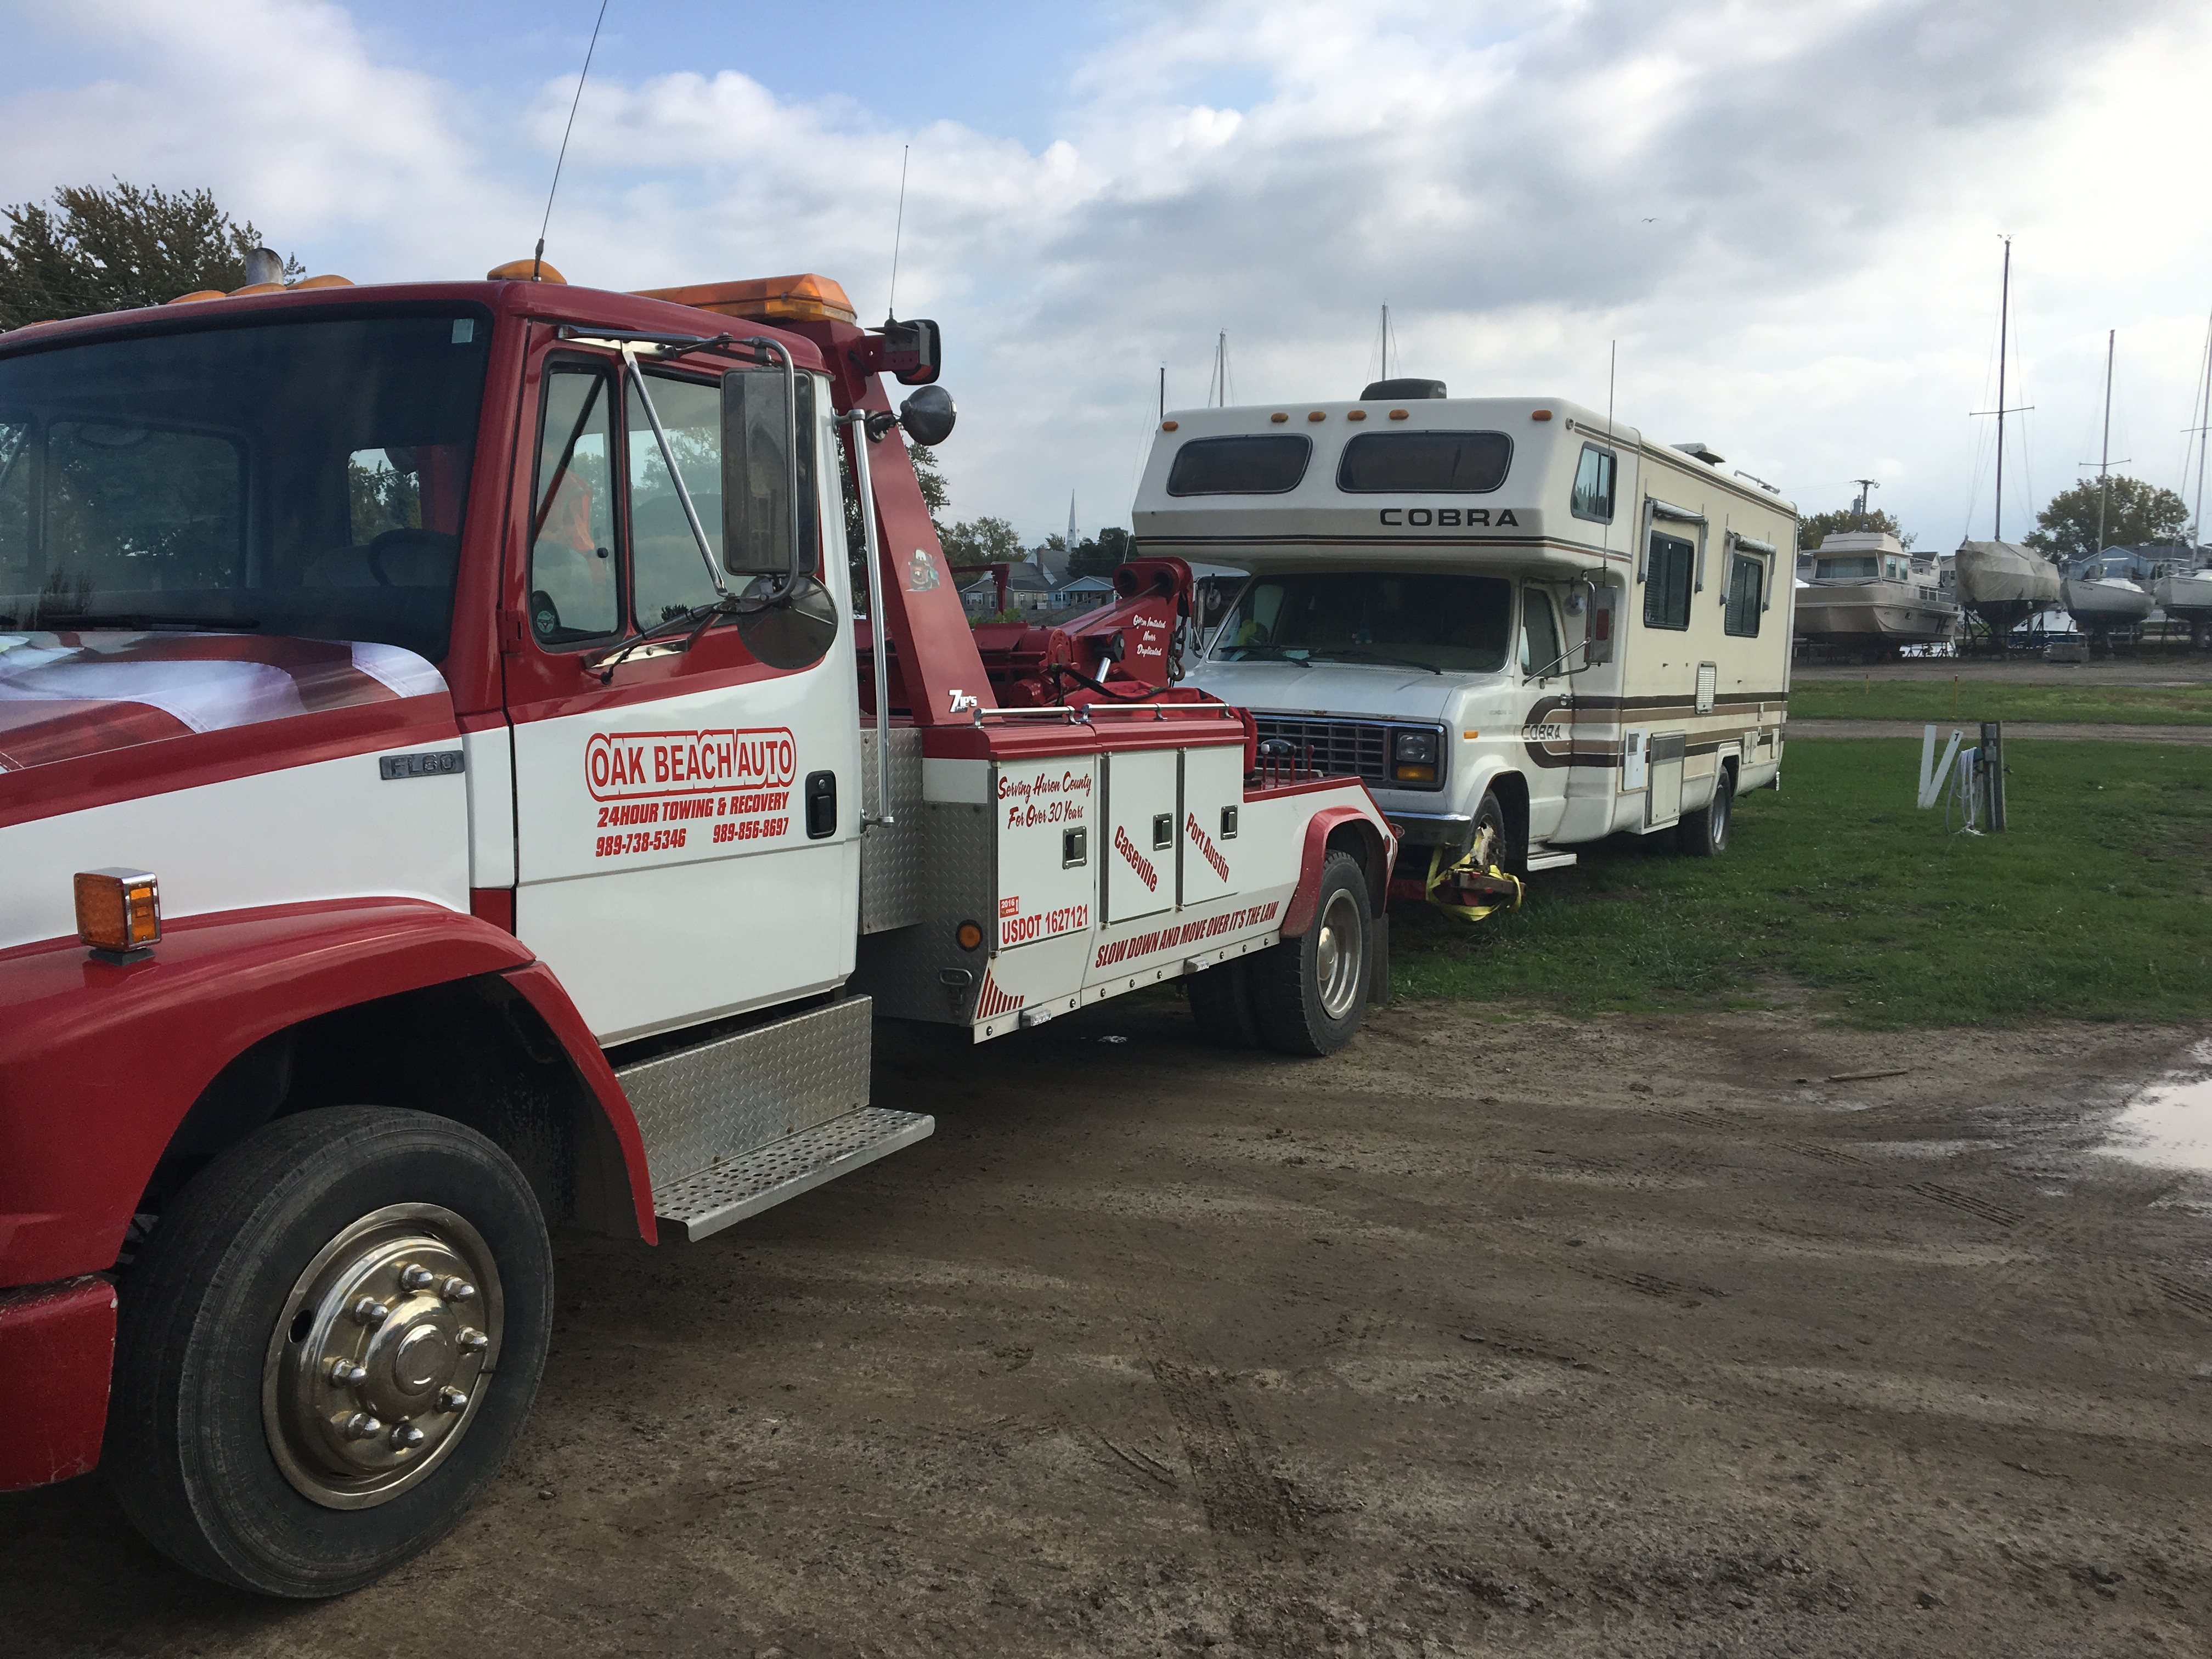 Oak Beach Auto Repair & Towing image 3